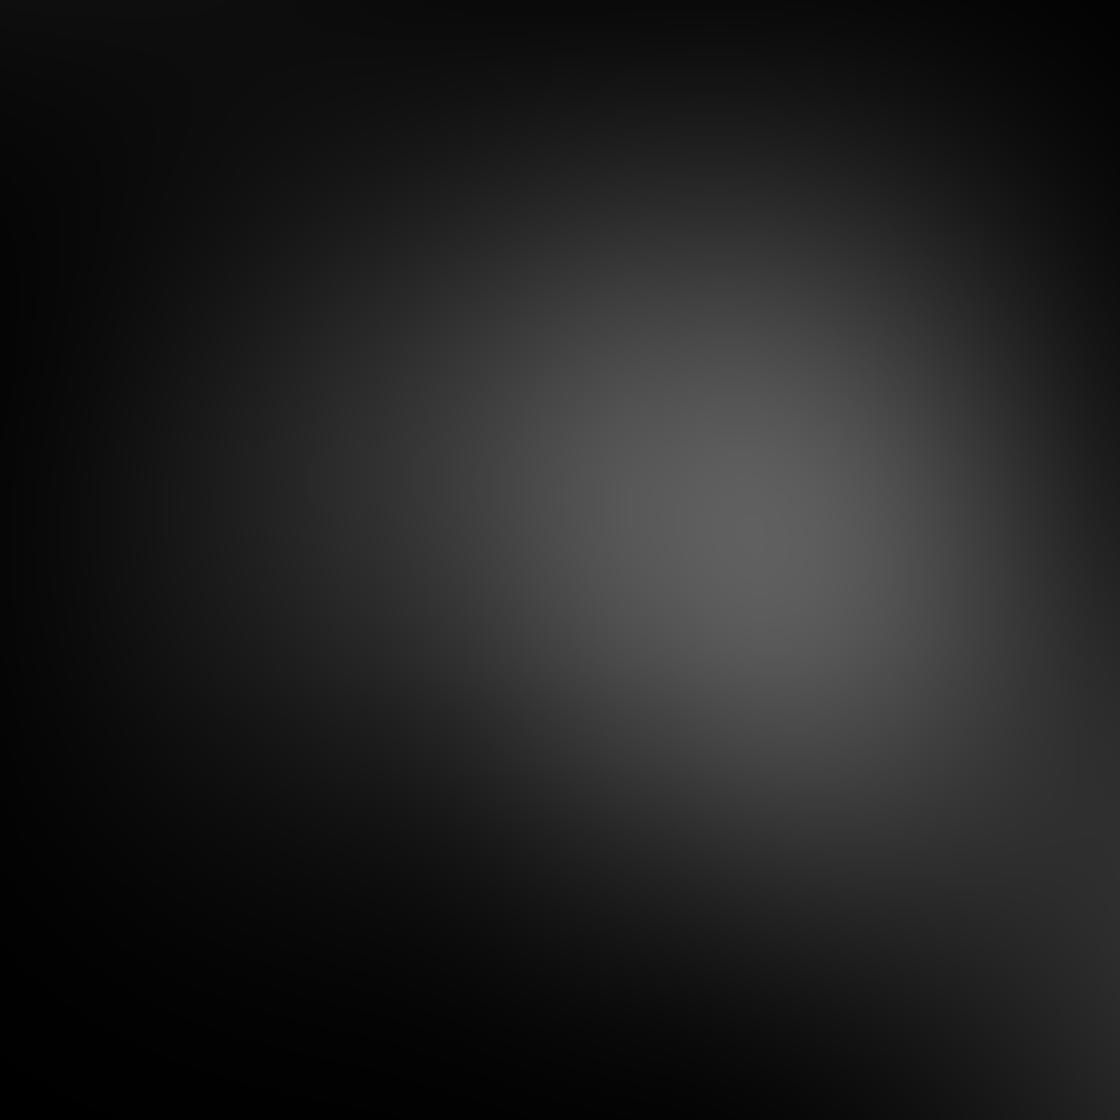 iPhone Photo Black White 29